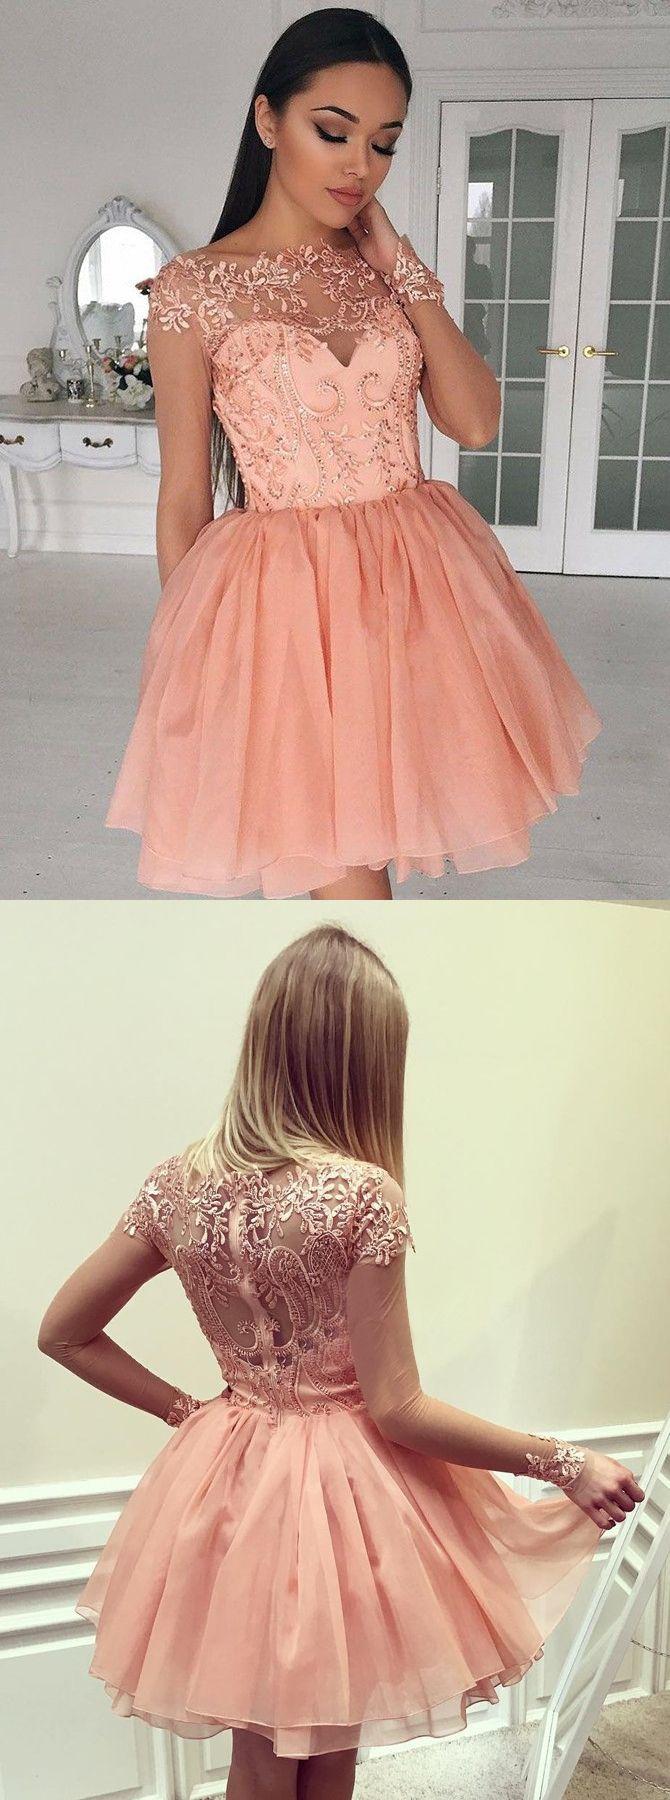 2017 homecoming dresses,short homecoming dresses,beaded homecoming dresses,unique homecoming dresses simple-dress.com